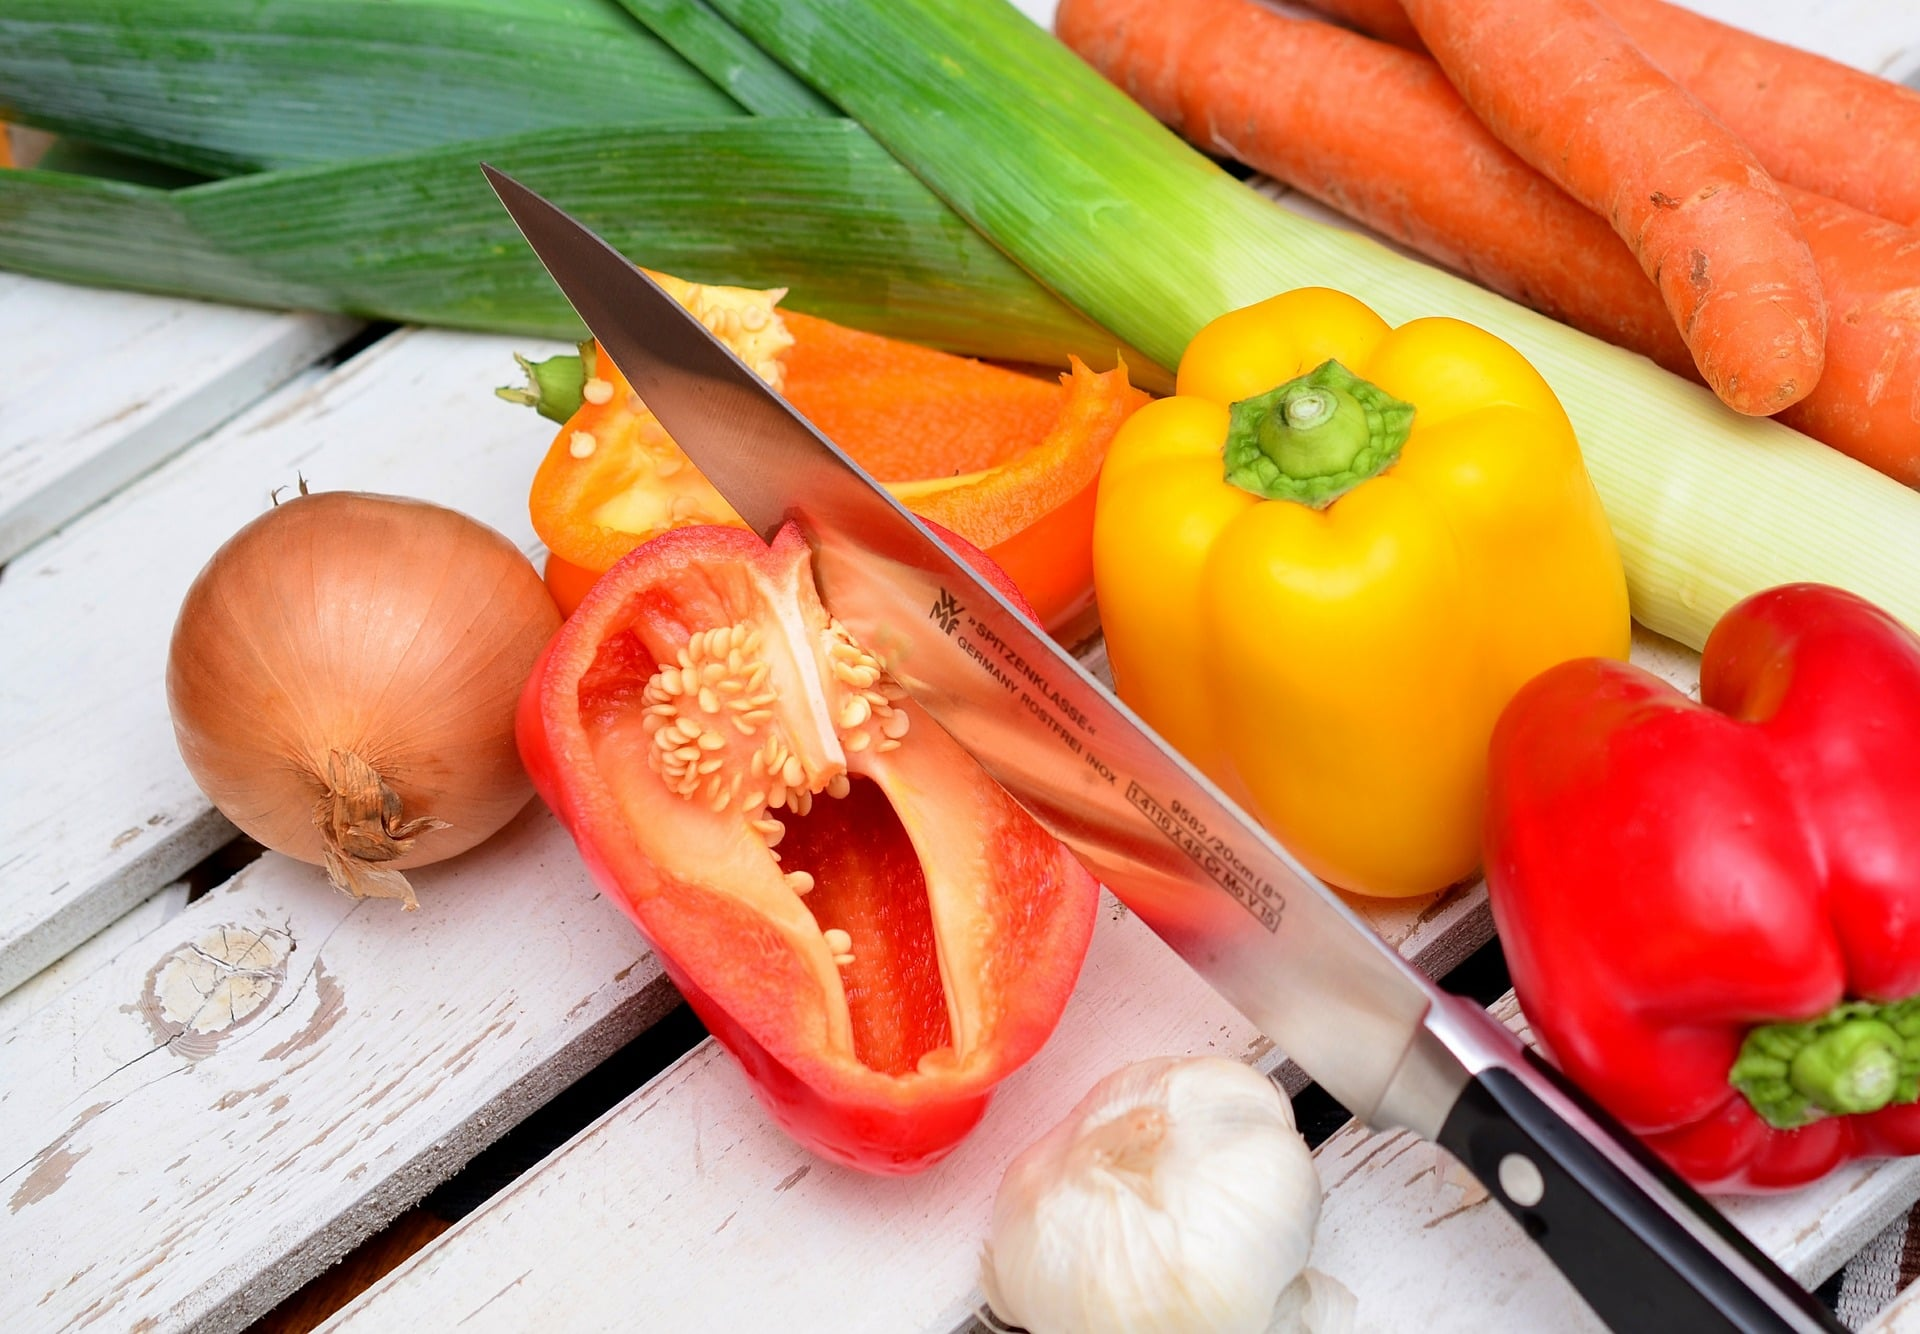 Grøntsager, løg, peberfrugter og en køkkenkniv